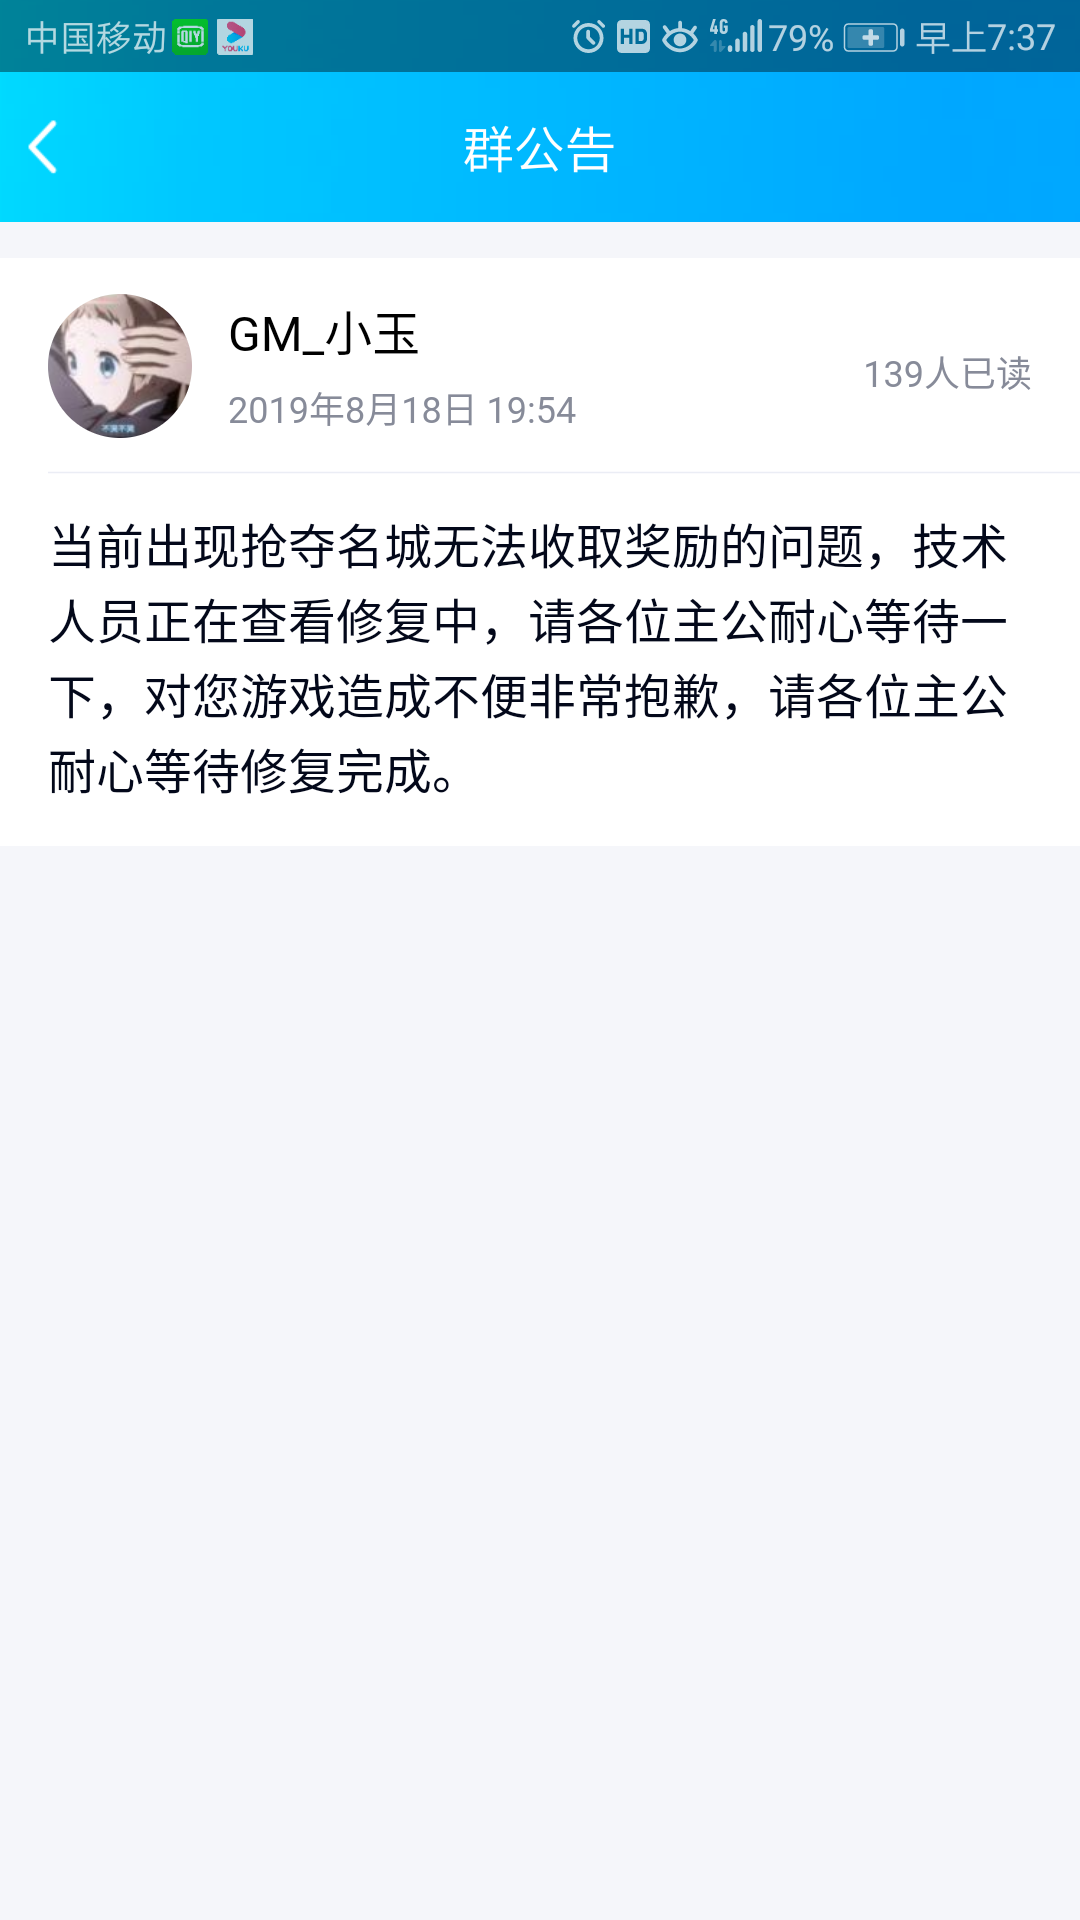 Screenshot_20190819-073712.png